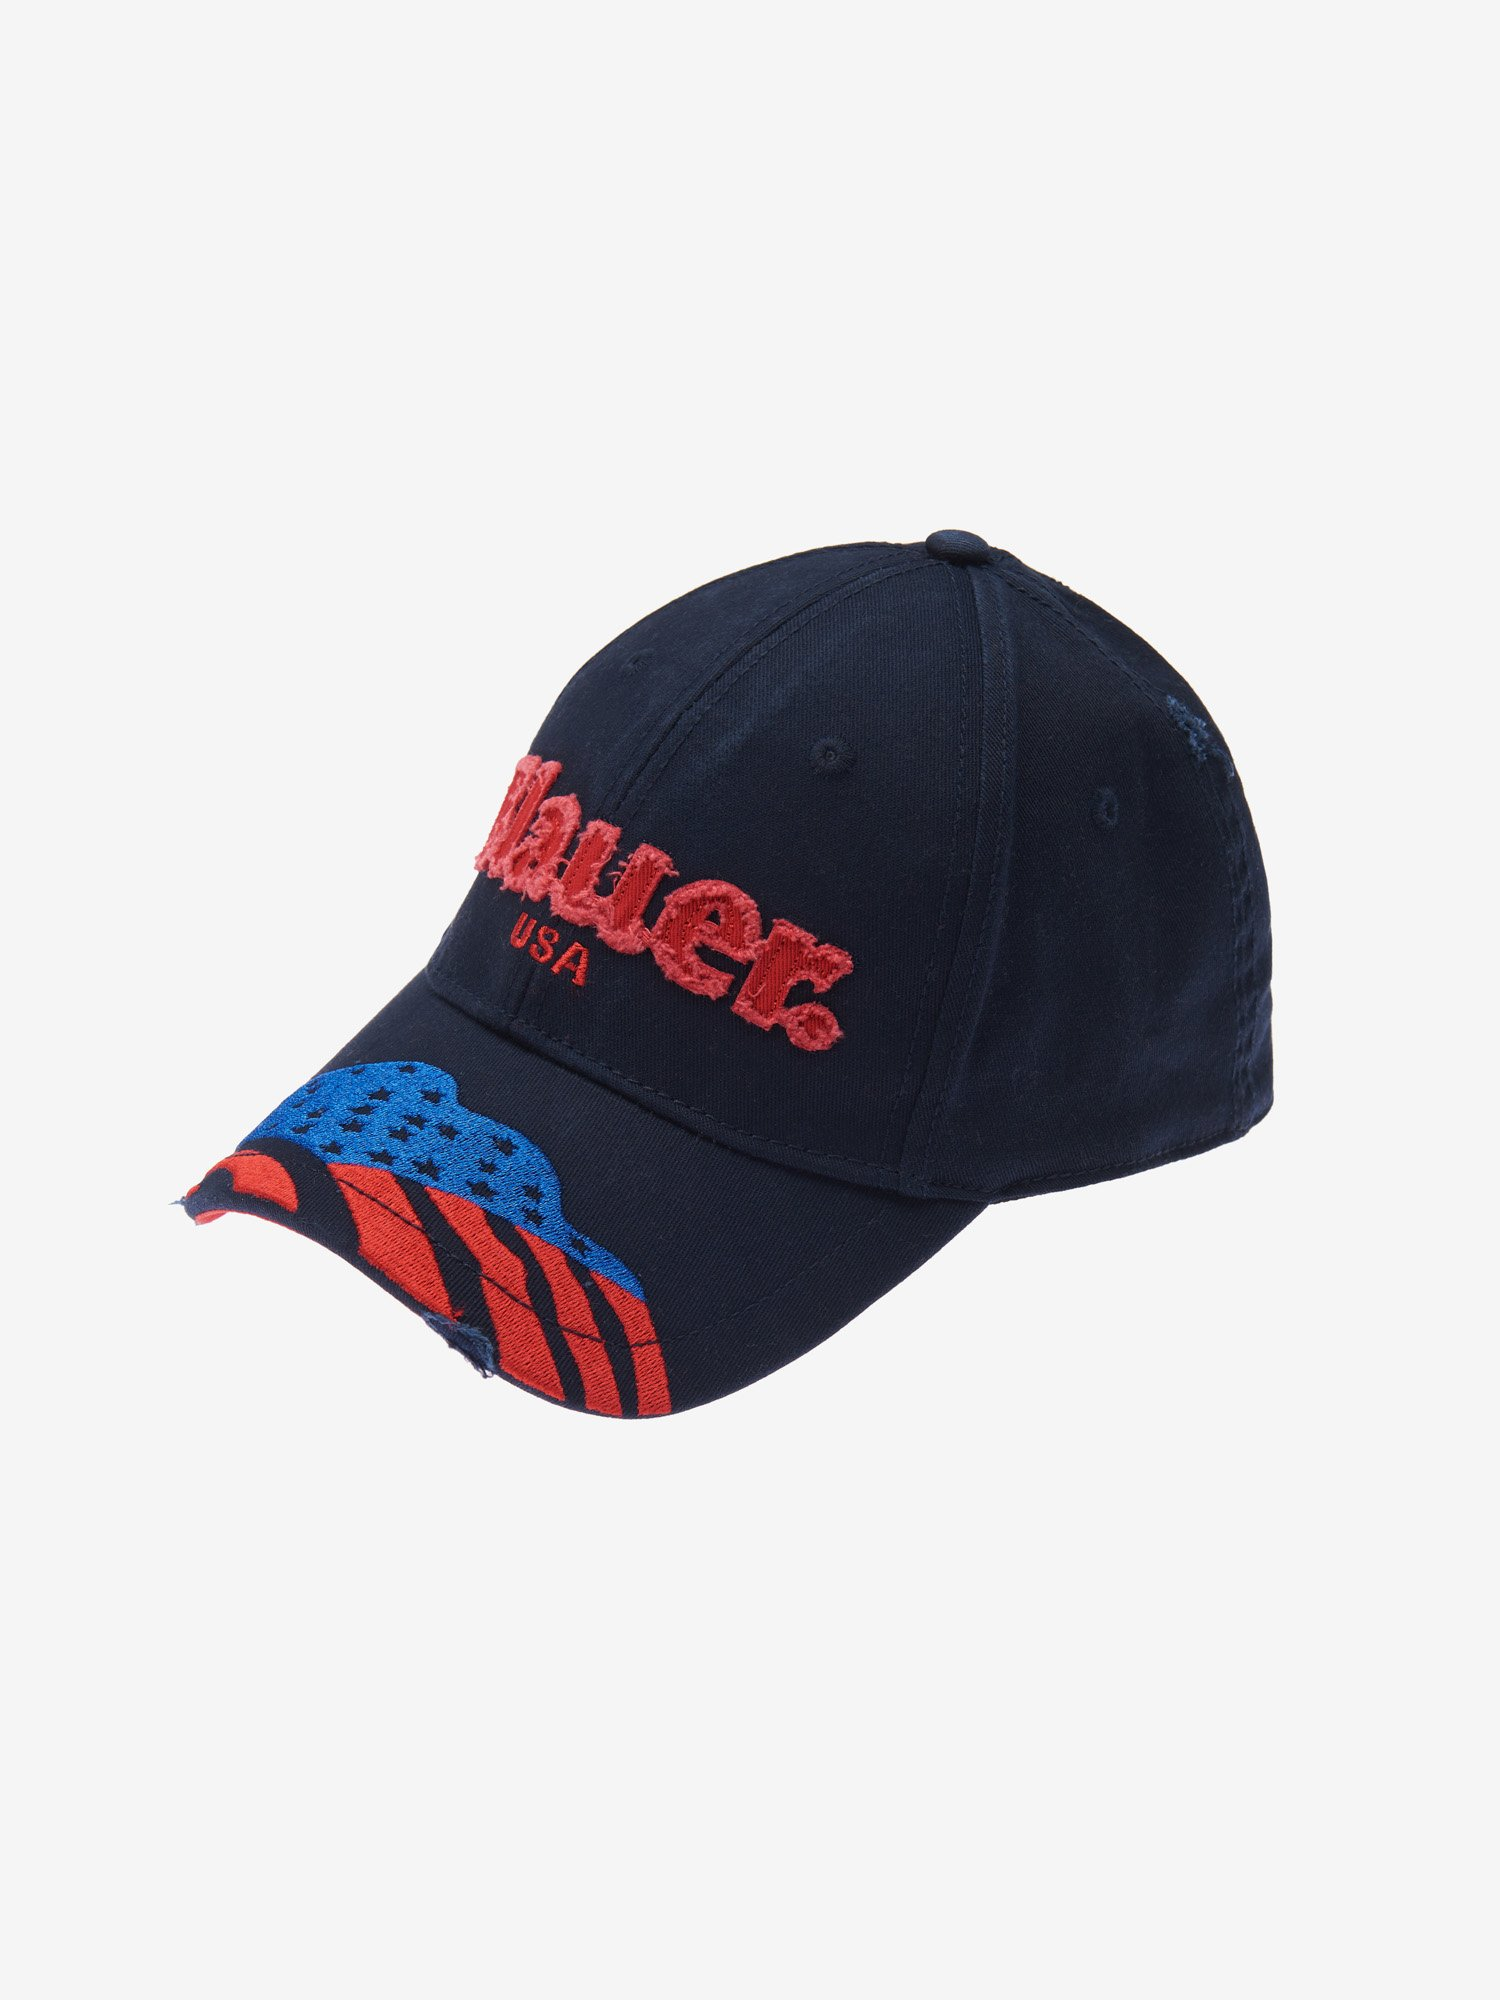 Blauer - BLAUER USA BASEBALL CAP - Blue Ink - Blauer